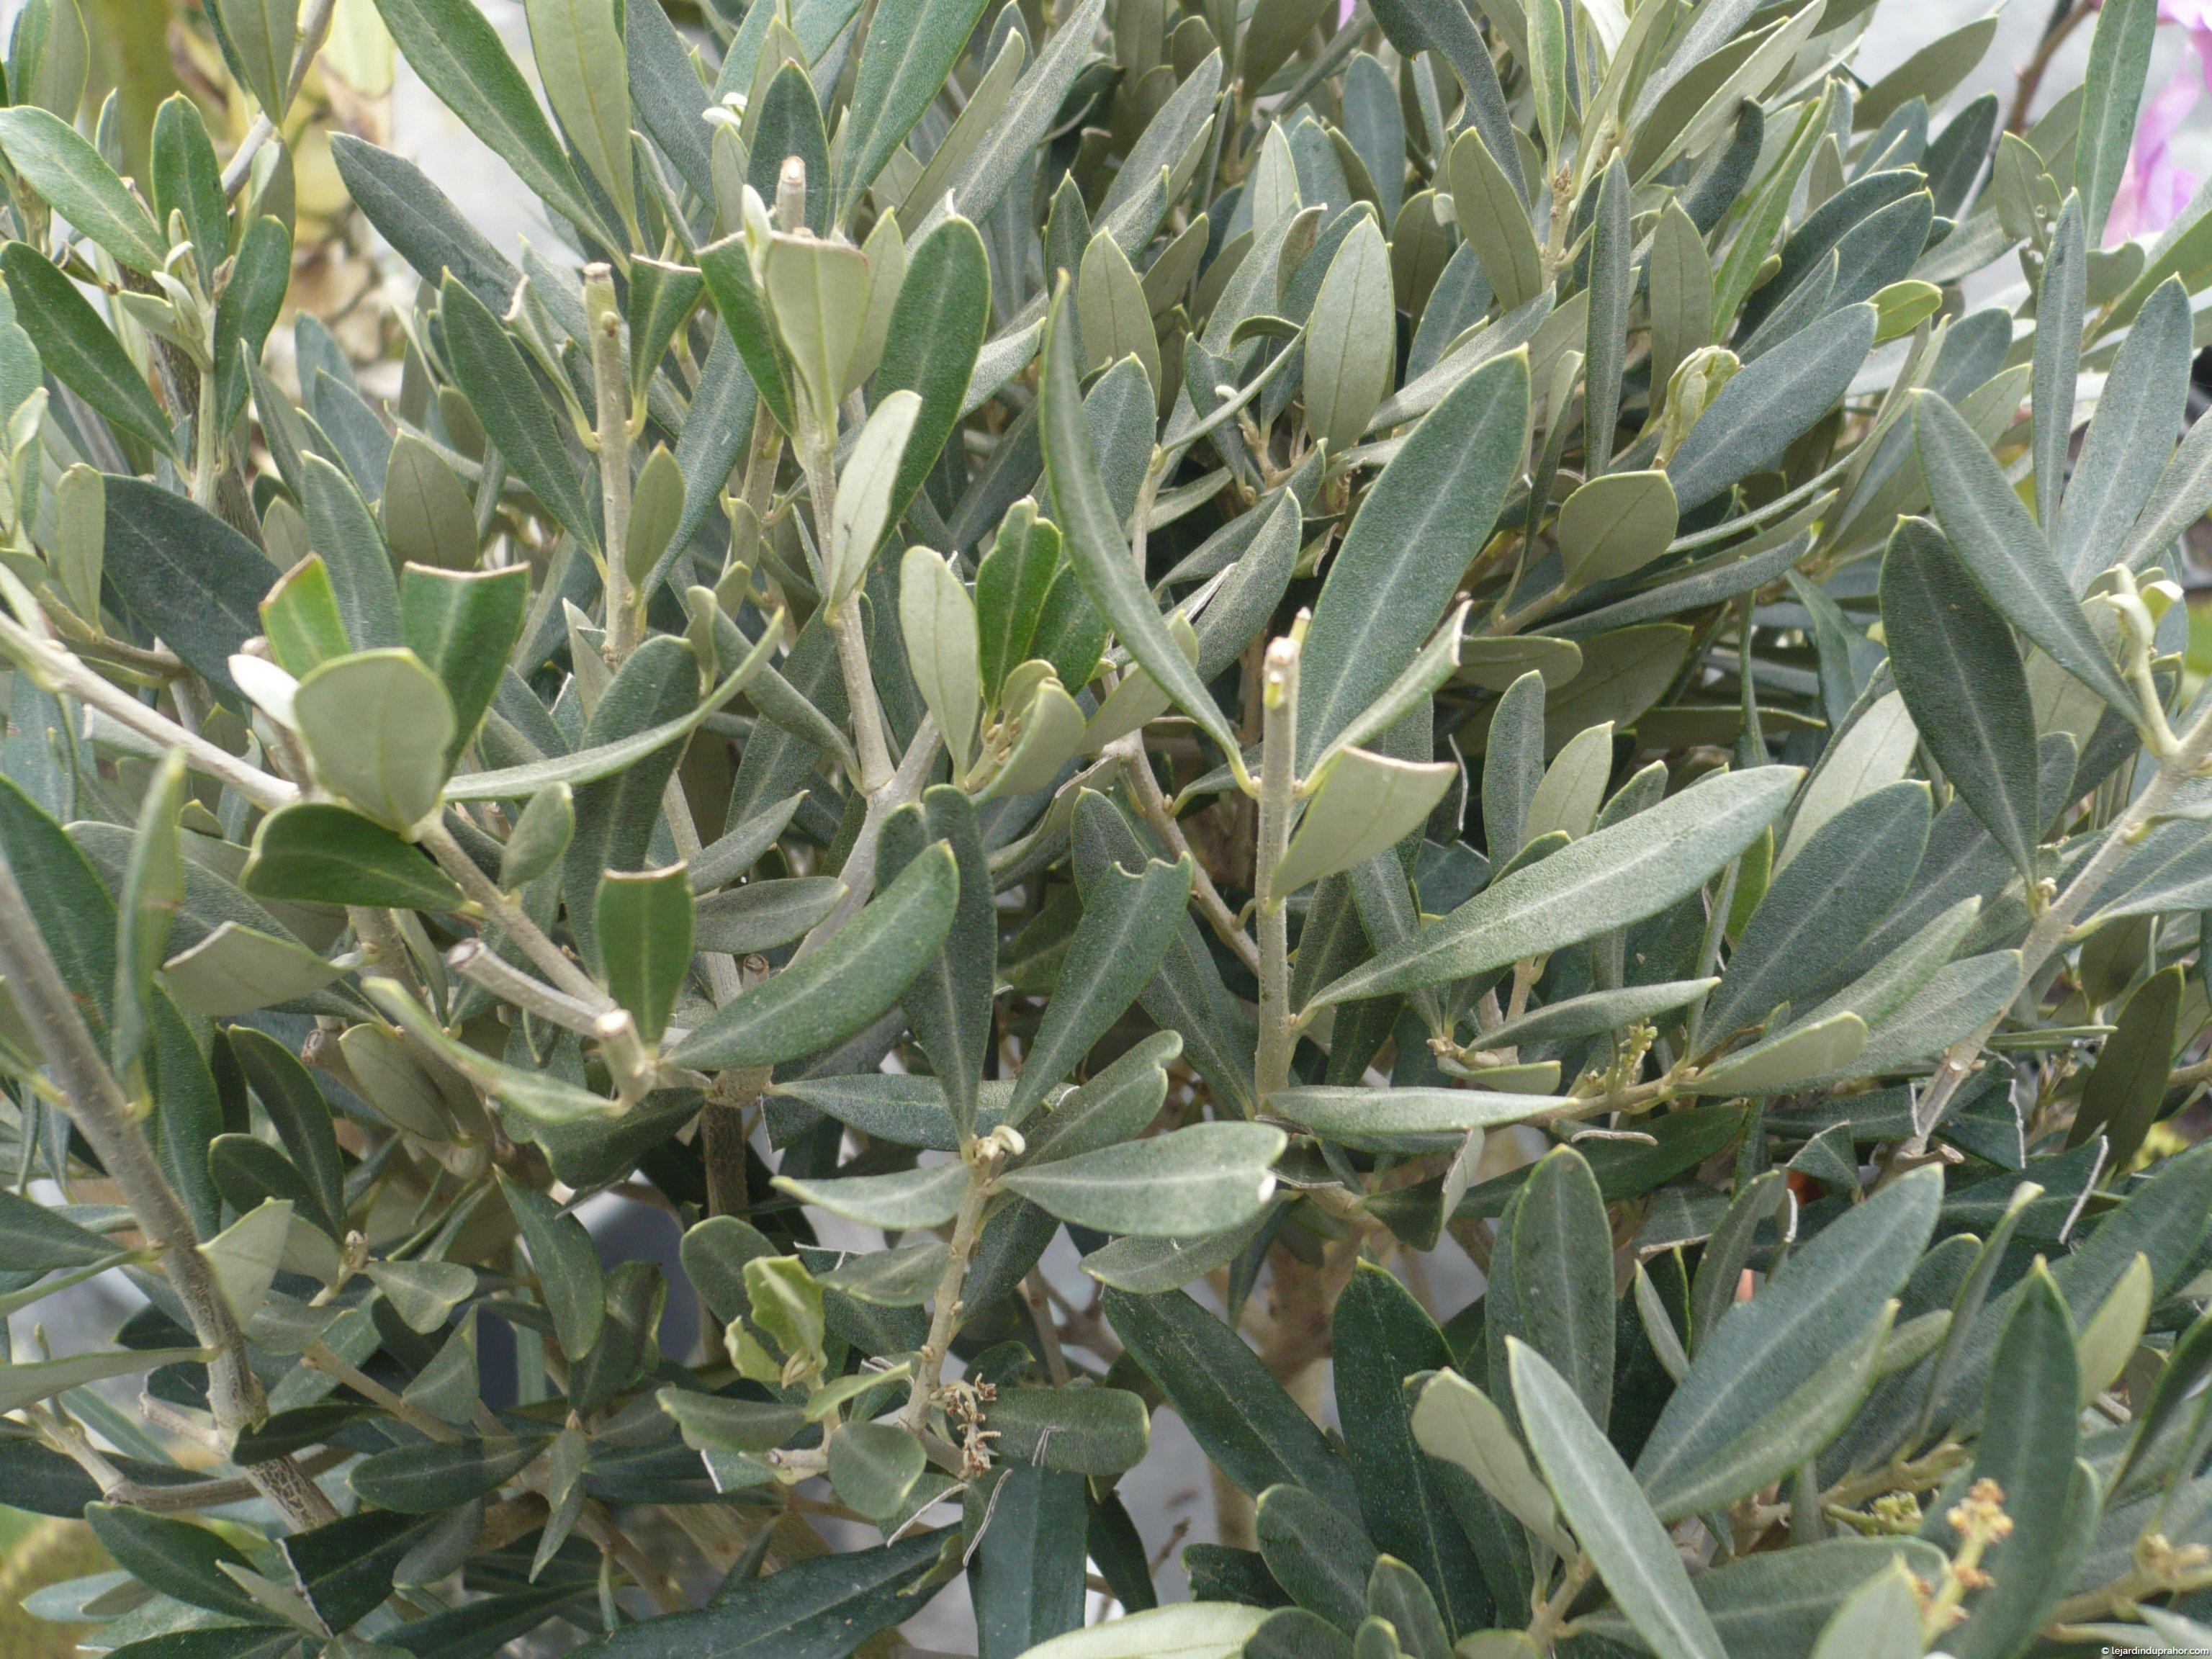 olivier commun en 1/2 tige ou en touffe - Le Jardin du Prahor